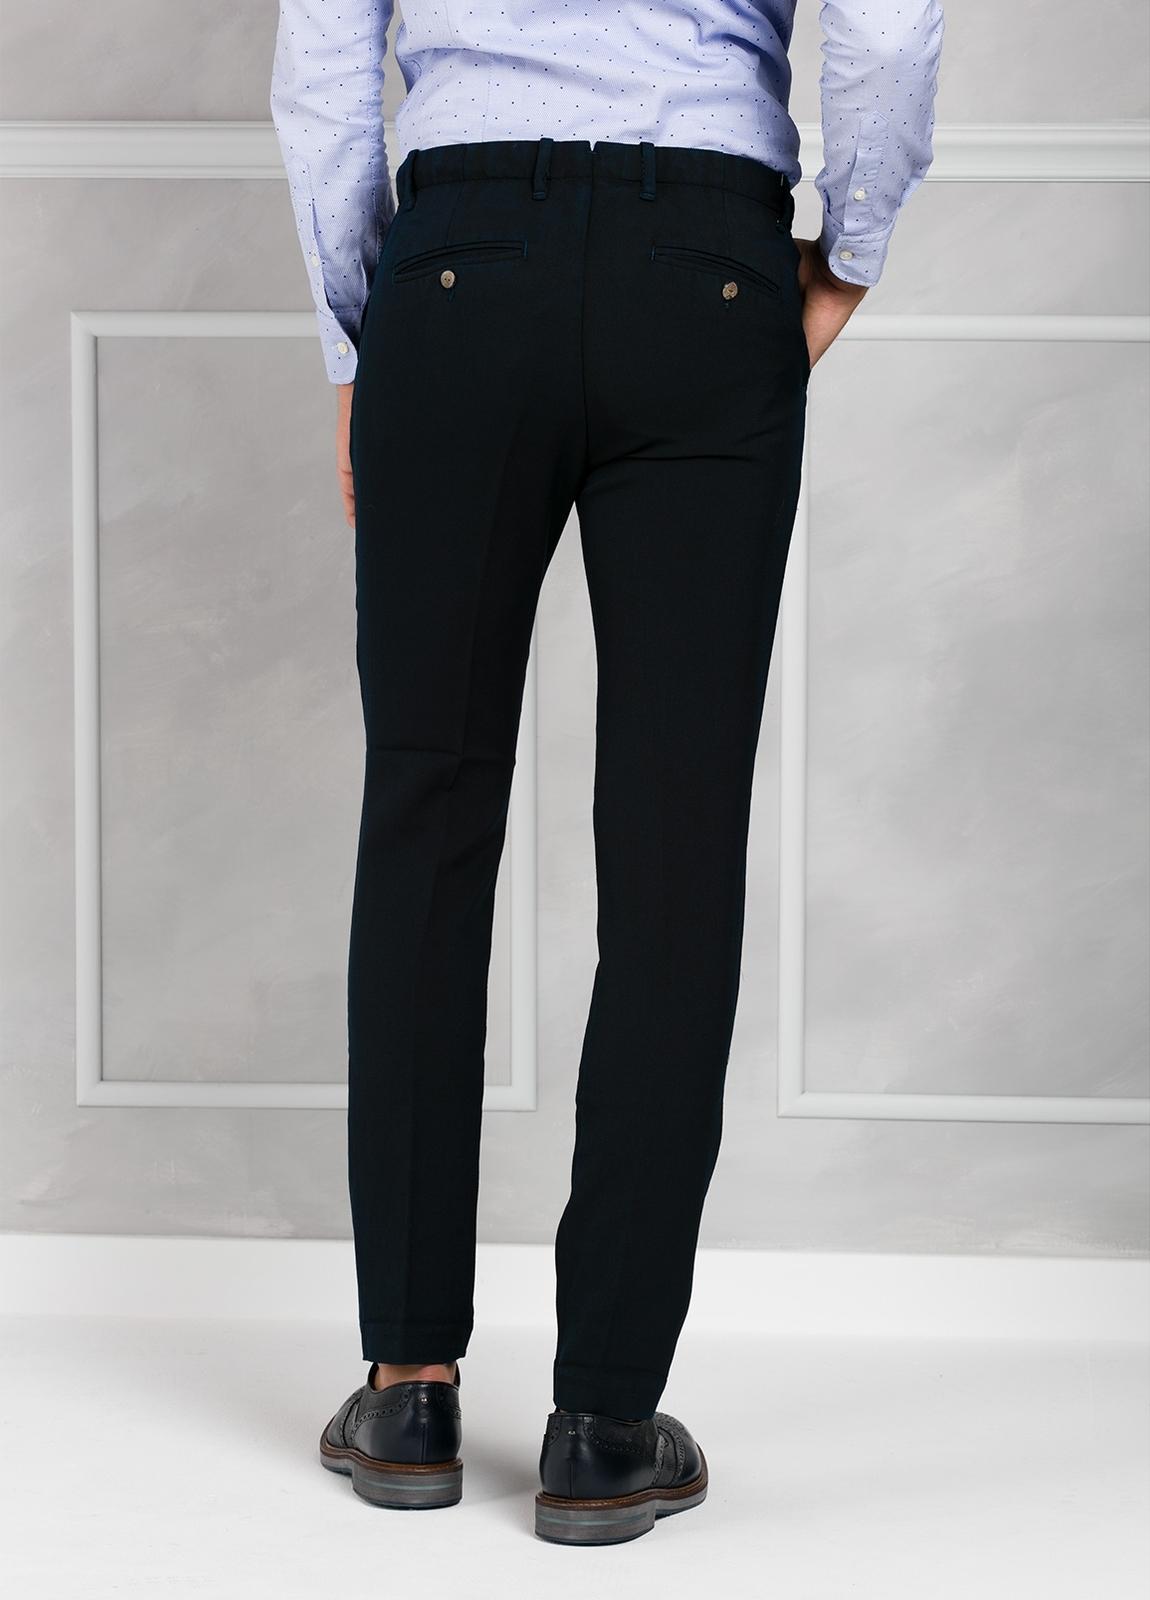 Pantalón sport Slim Fit con pliegues color azul marino. 100% Lana lavada. - Ítem1